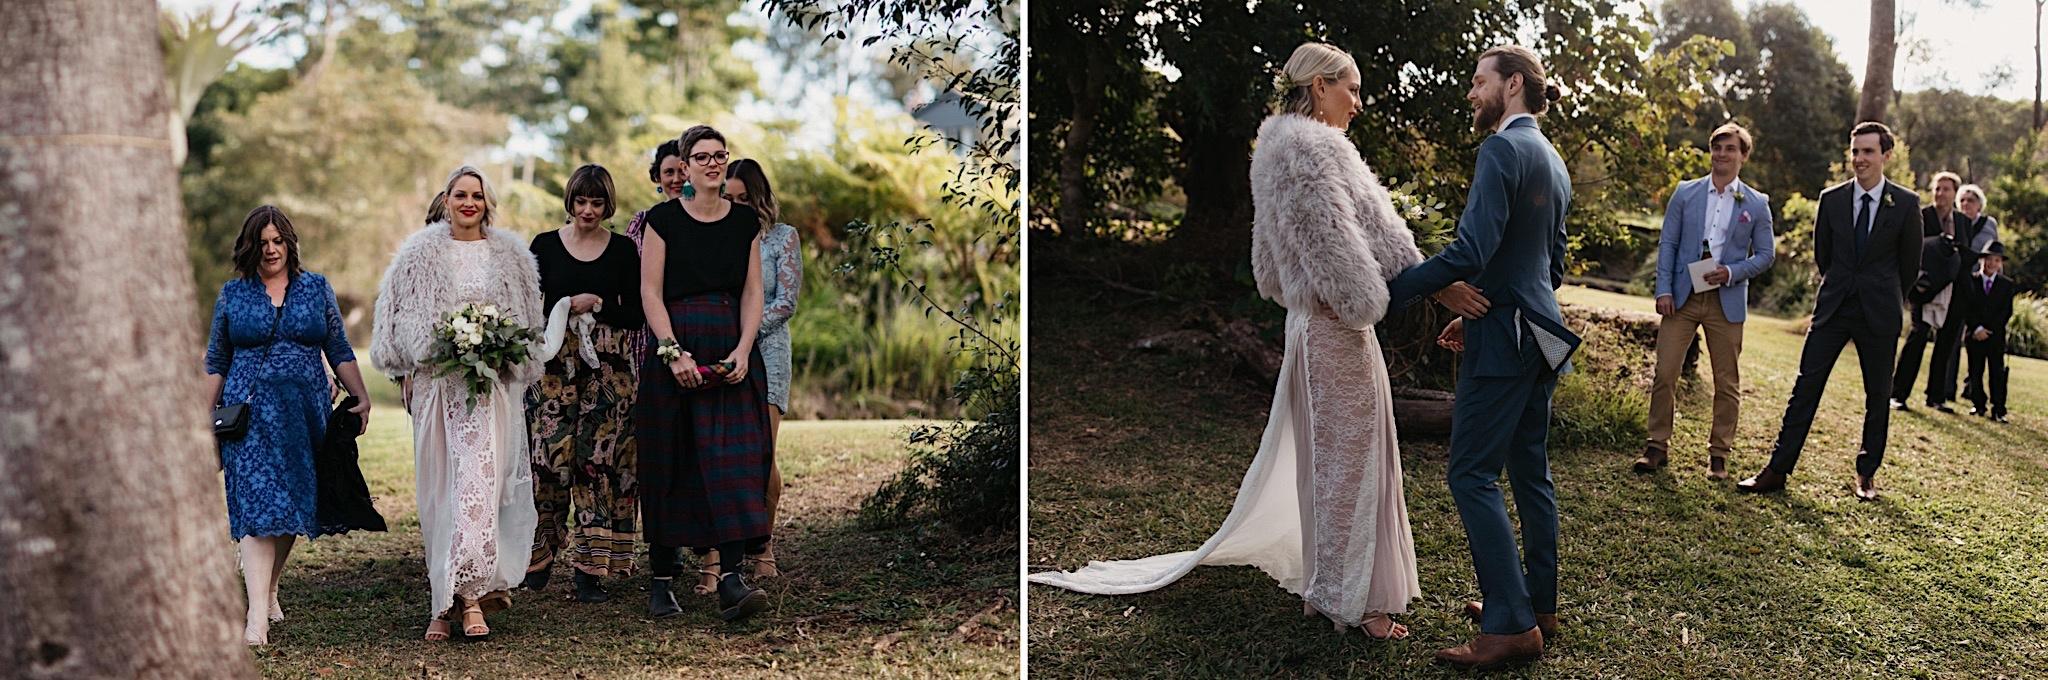 027_SBA-Jen-Tom-Wedding-79_SBA-Jen-Tom-Wedding-83.jpg